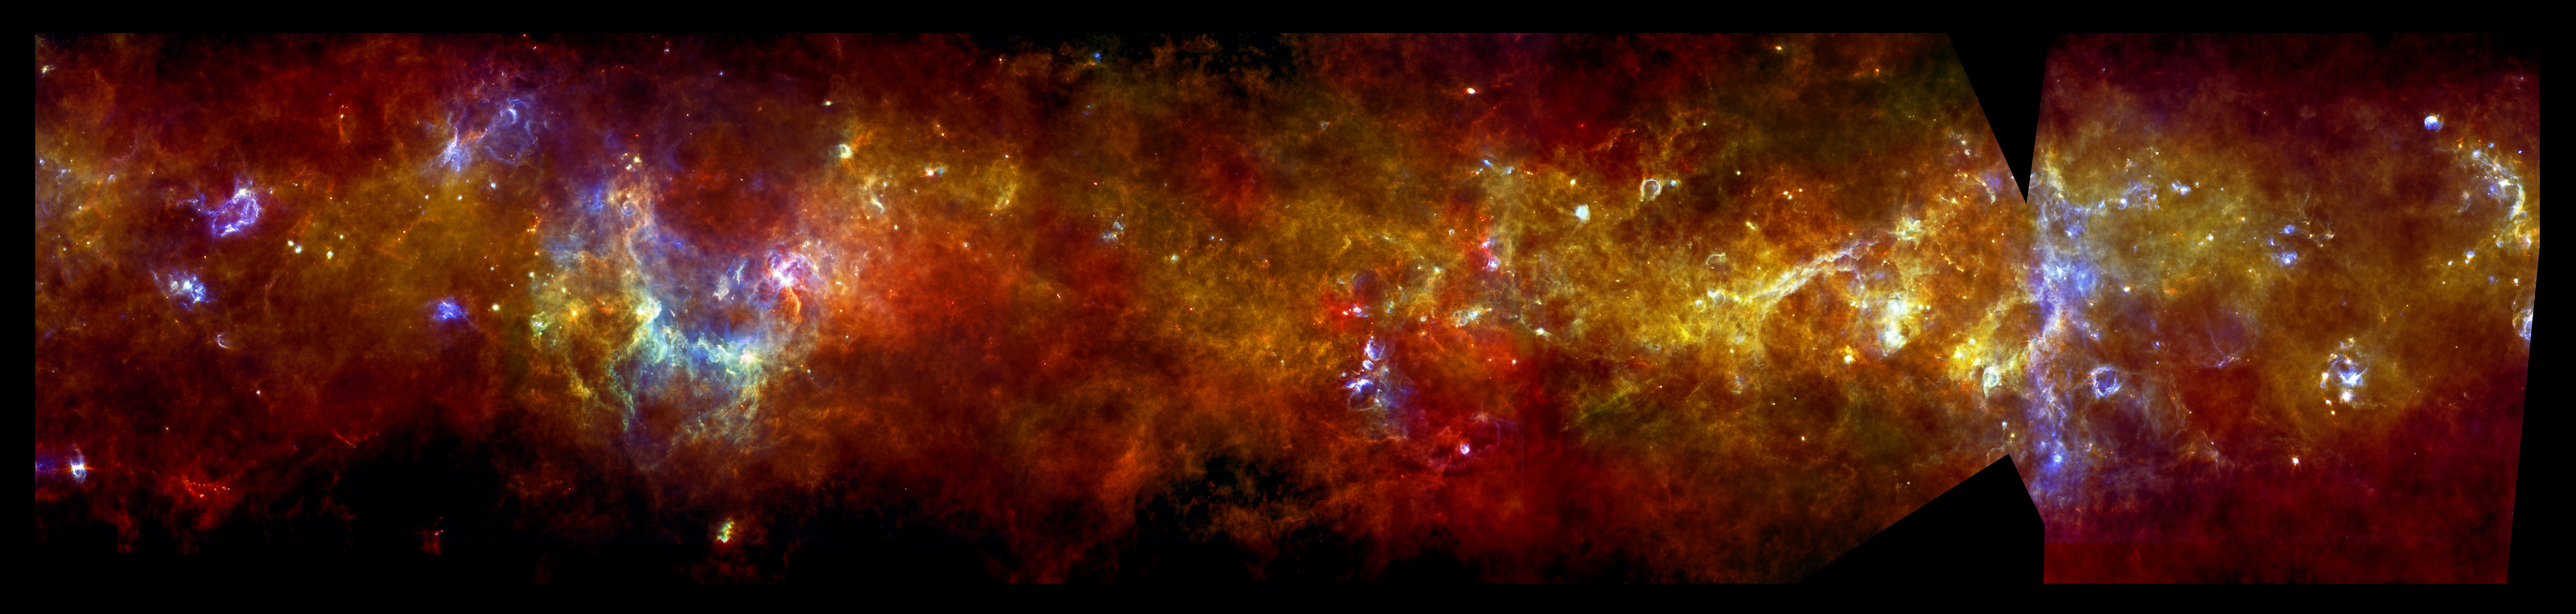 1567216010198-ESA_Herschel_Galactic_Plane_HiGal_full.jpg